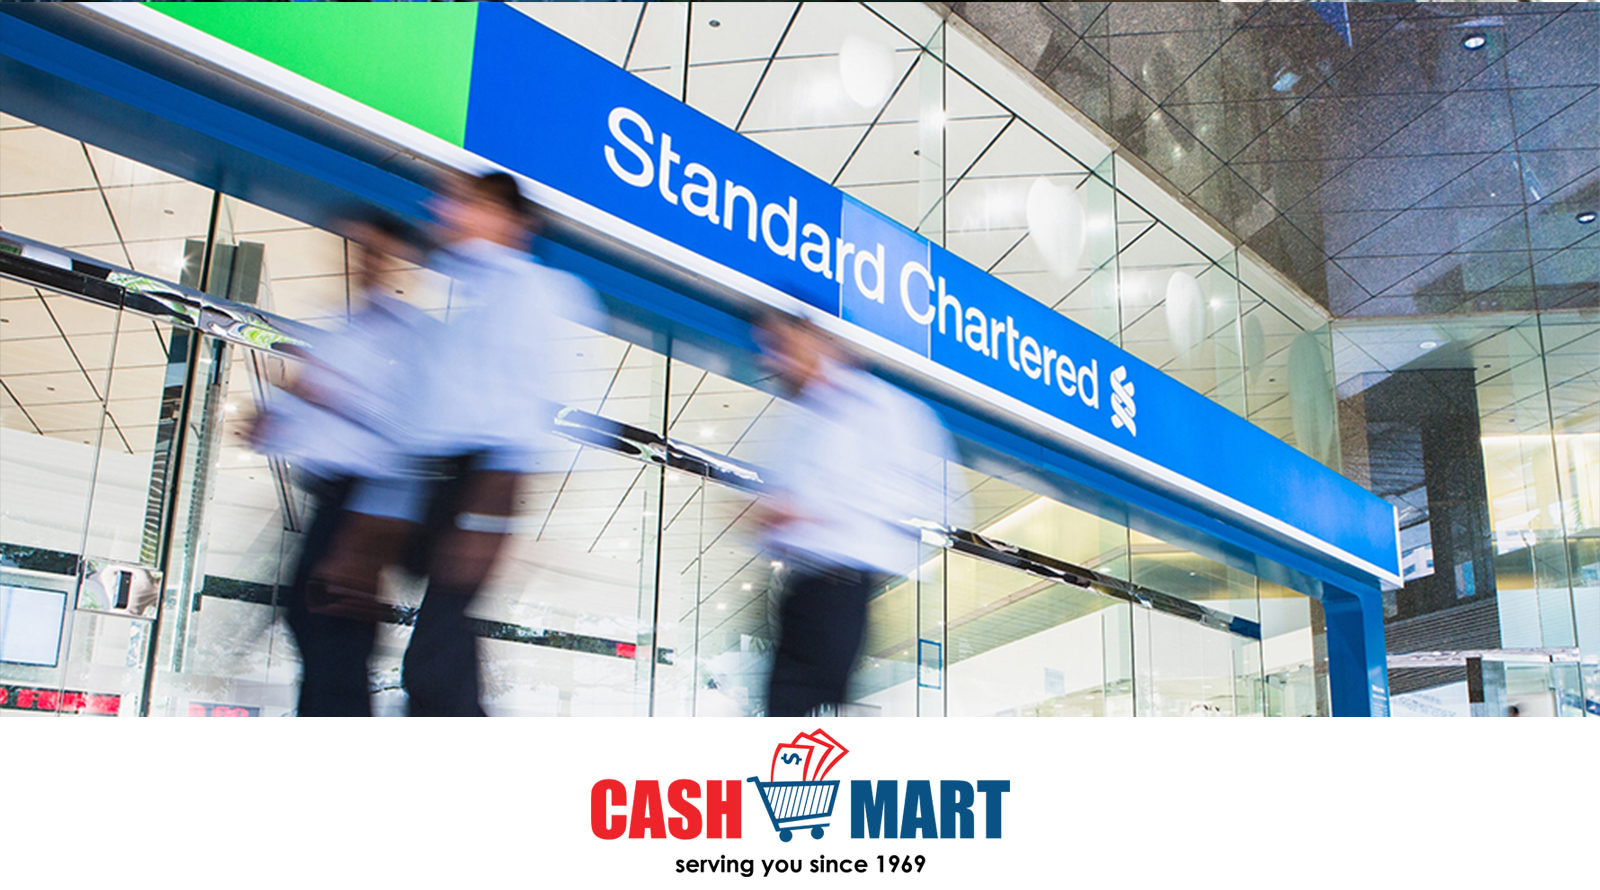 Standard Chartered Personal Loan Singapore